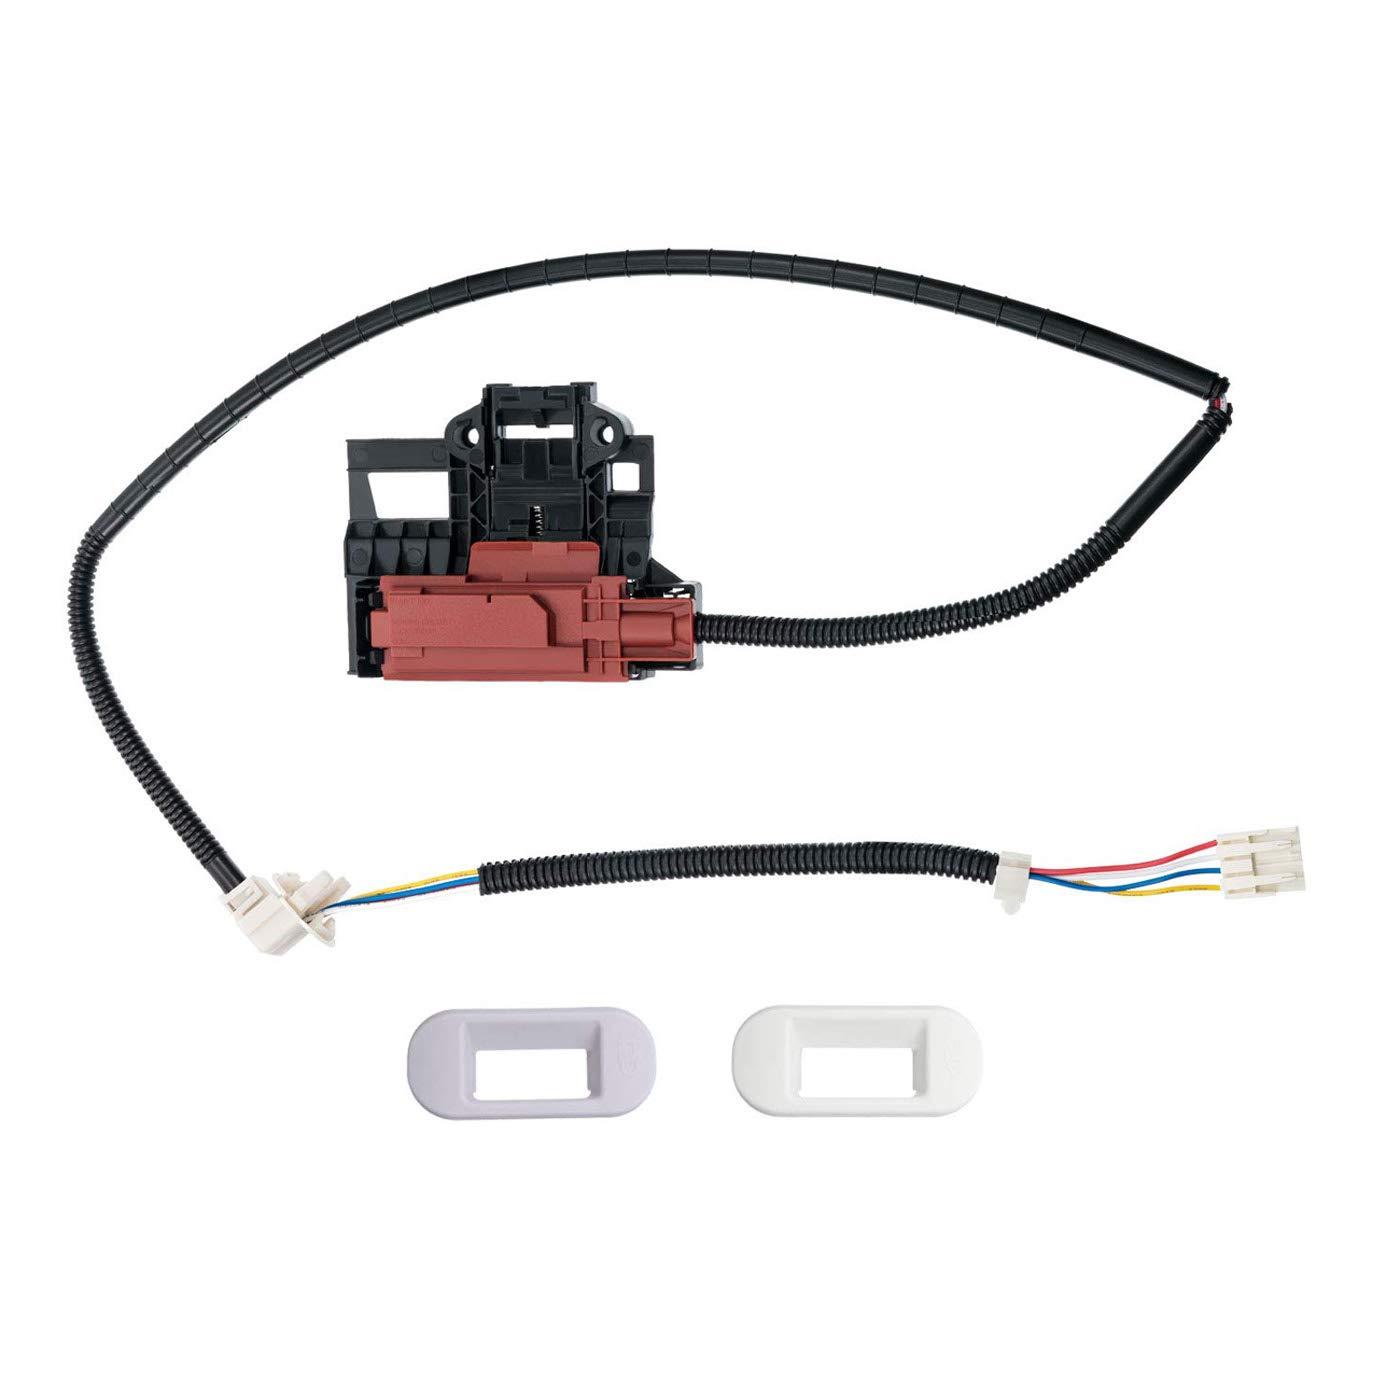 Siwdoy W10404050 Lid Lock Latch Switch for Whirlpool Kenmore Washing Machine W10238287 AP5263307 PS3497627